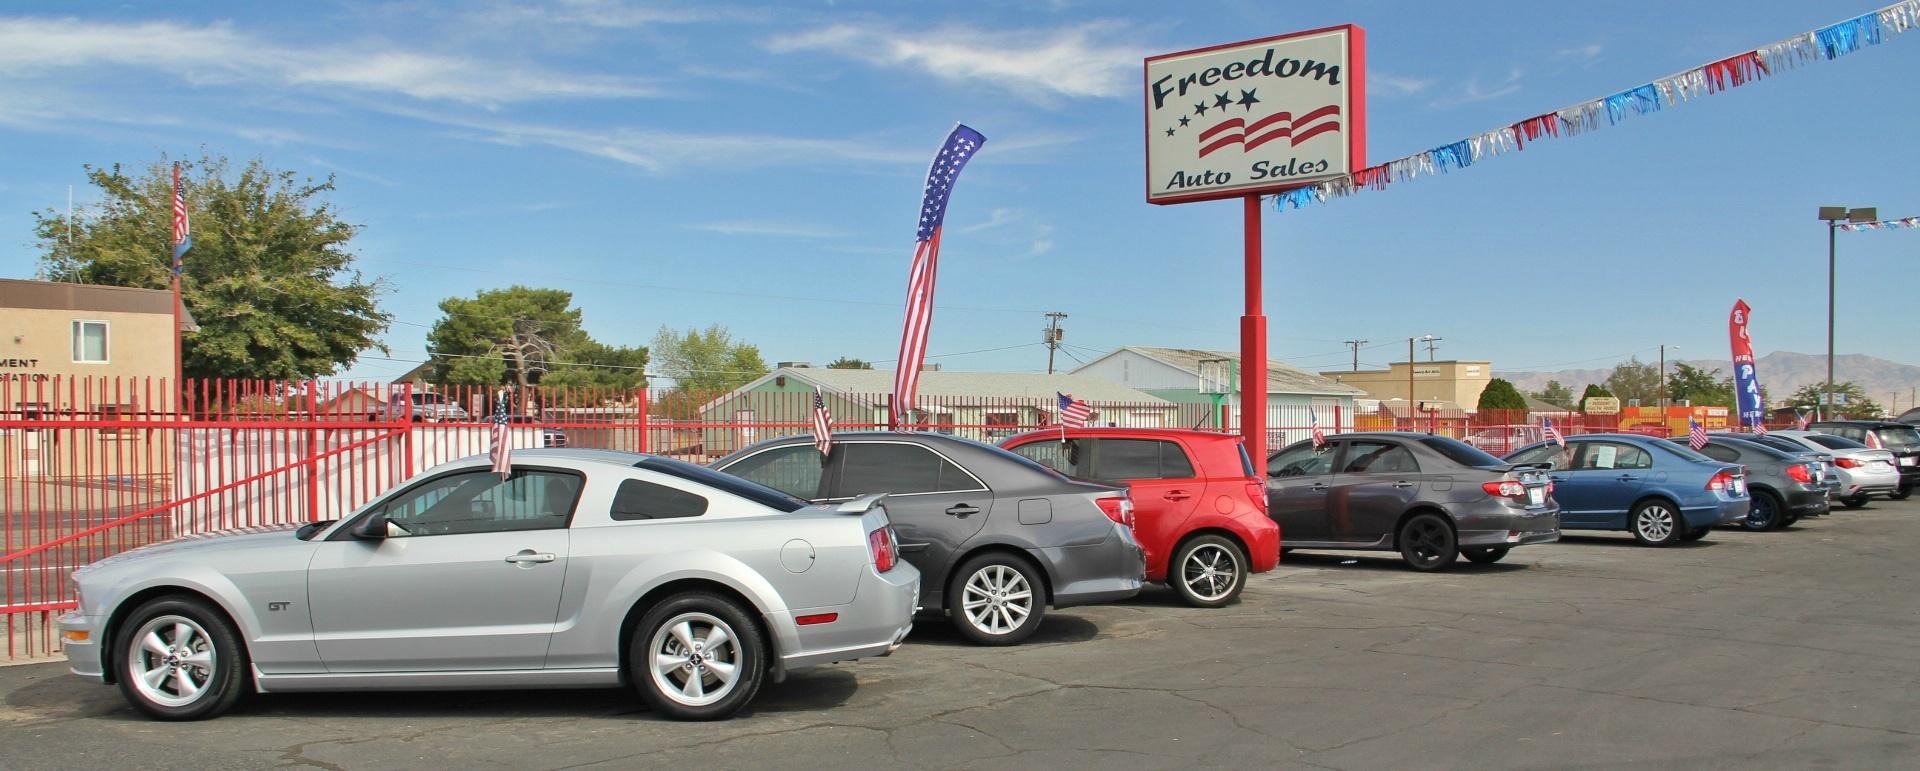 freedom auto sales kingman az used car dealership. Black Bedroom Furniture Sets. Home Design Ideas